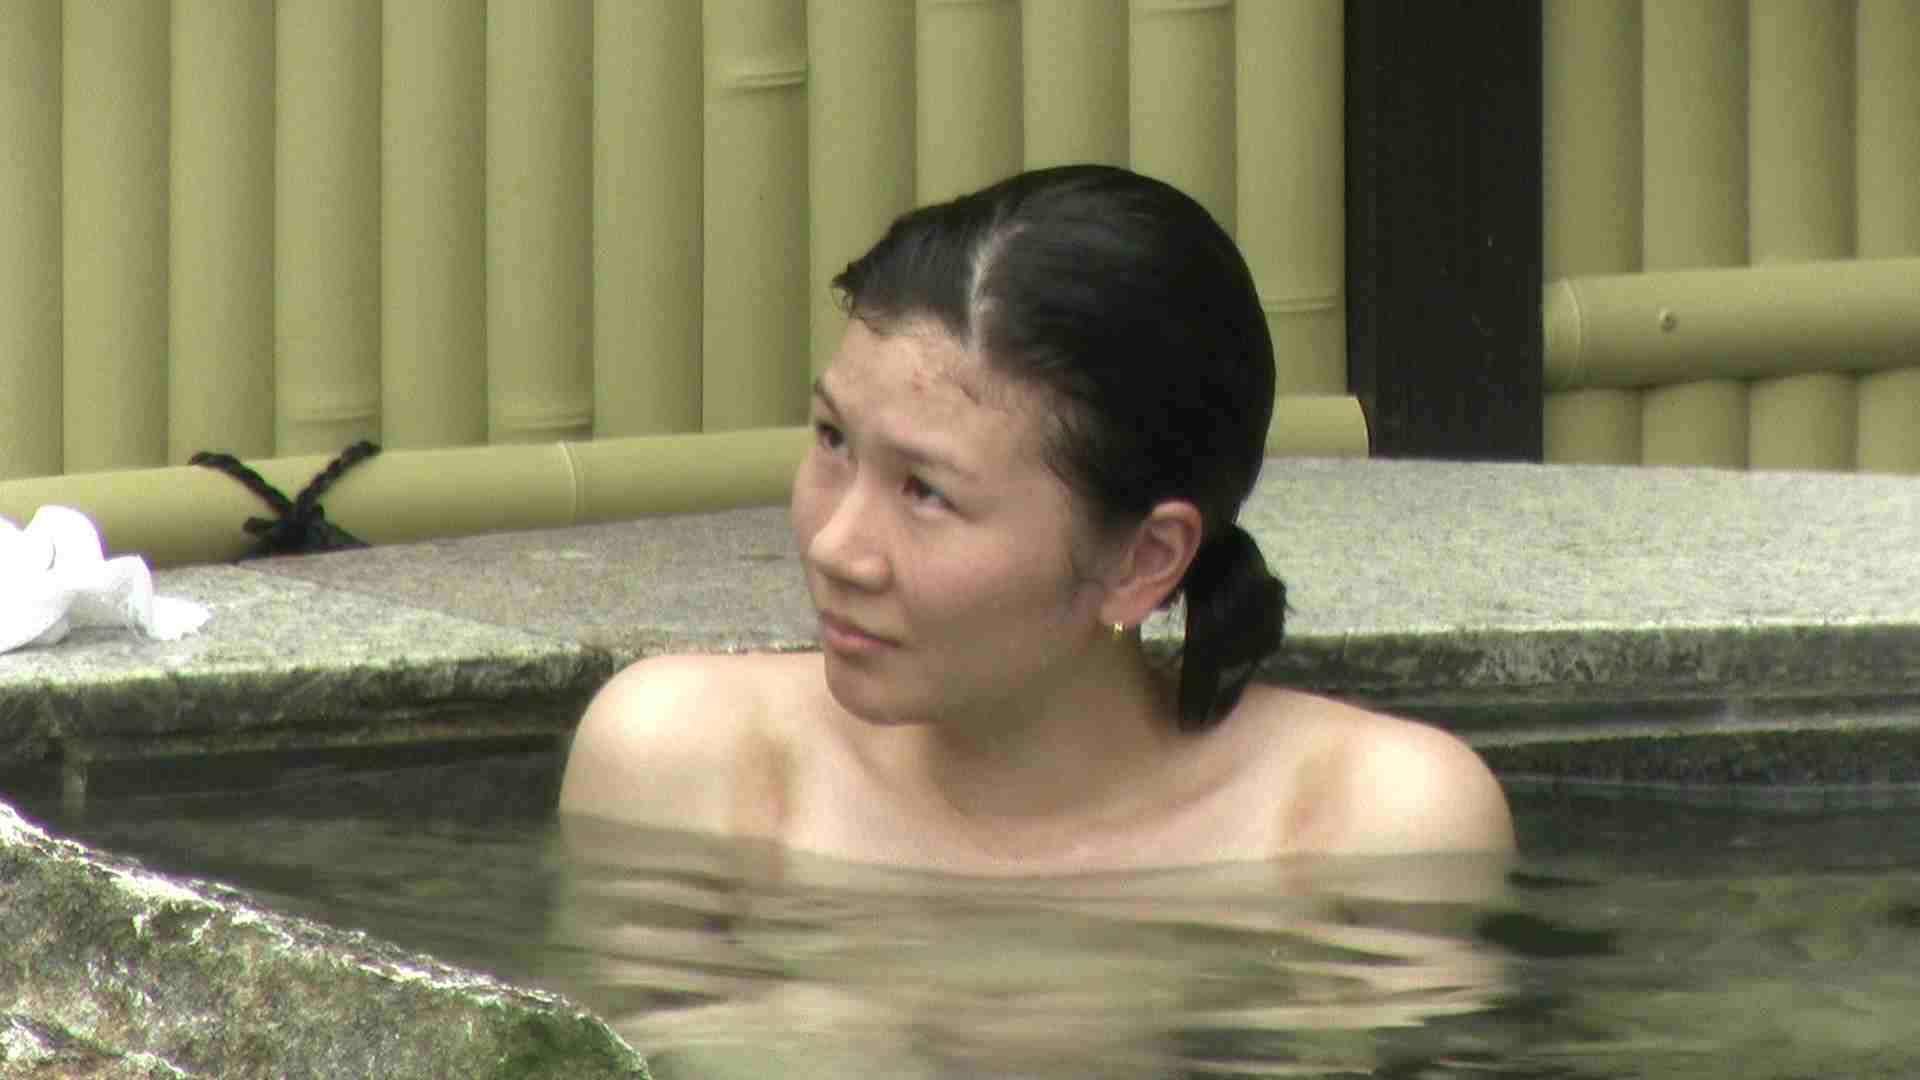 Aquaな露天風呂Vol.187 盗撮  63連発 28